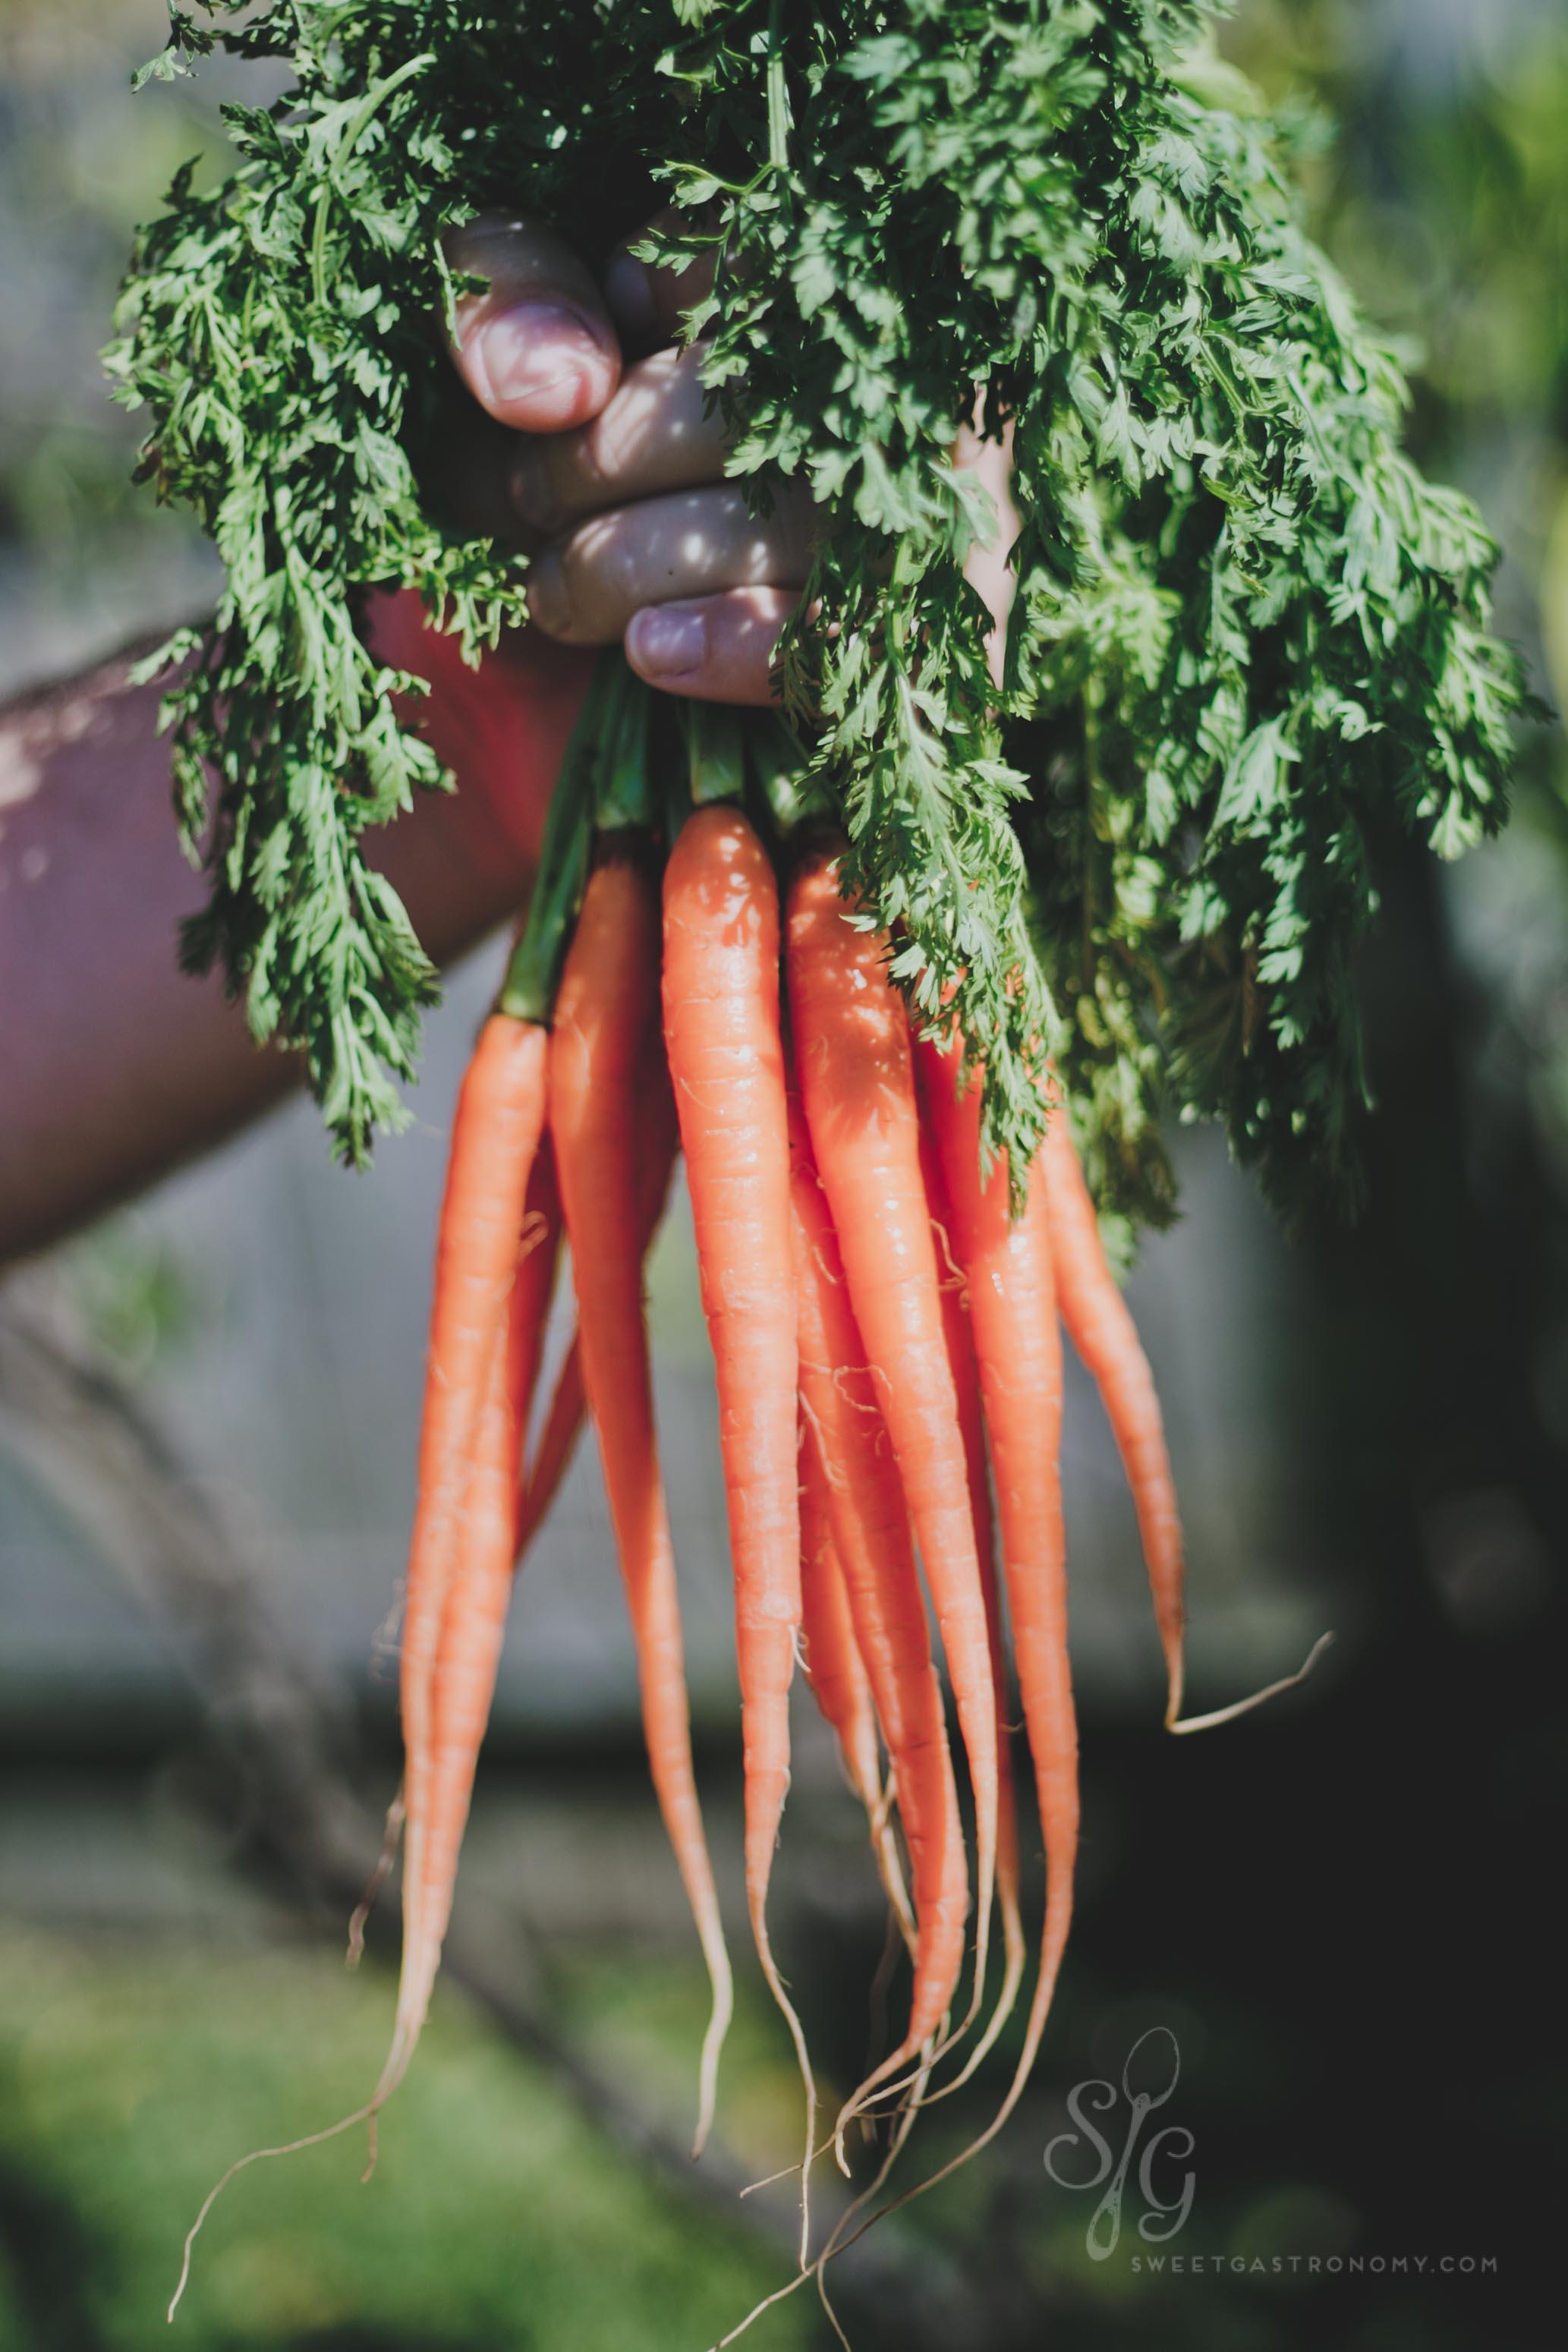 sweetgastronomy.com_carrots